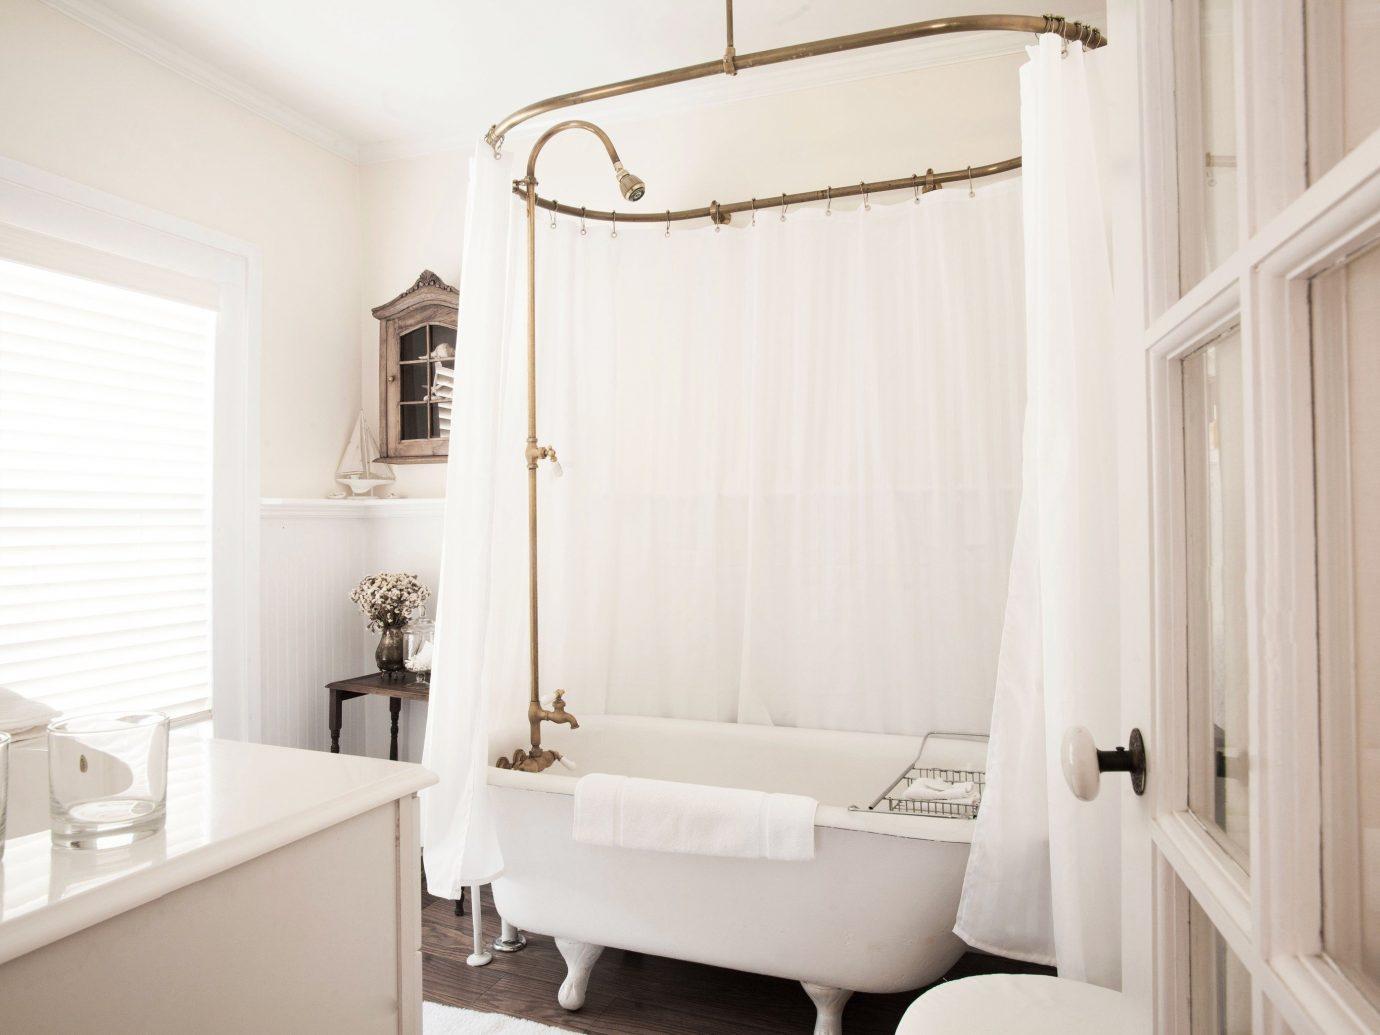 Trip Ideas indoor wall window bathroom room property interior design floor home white Design plumbing fixture curtain window covering cottage apartment furniture Bath bathtub